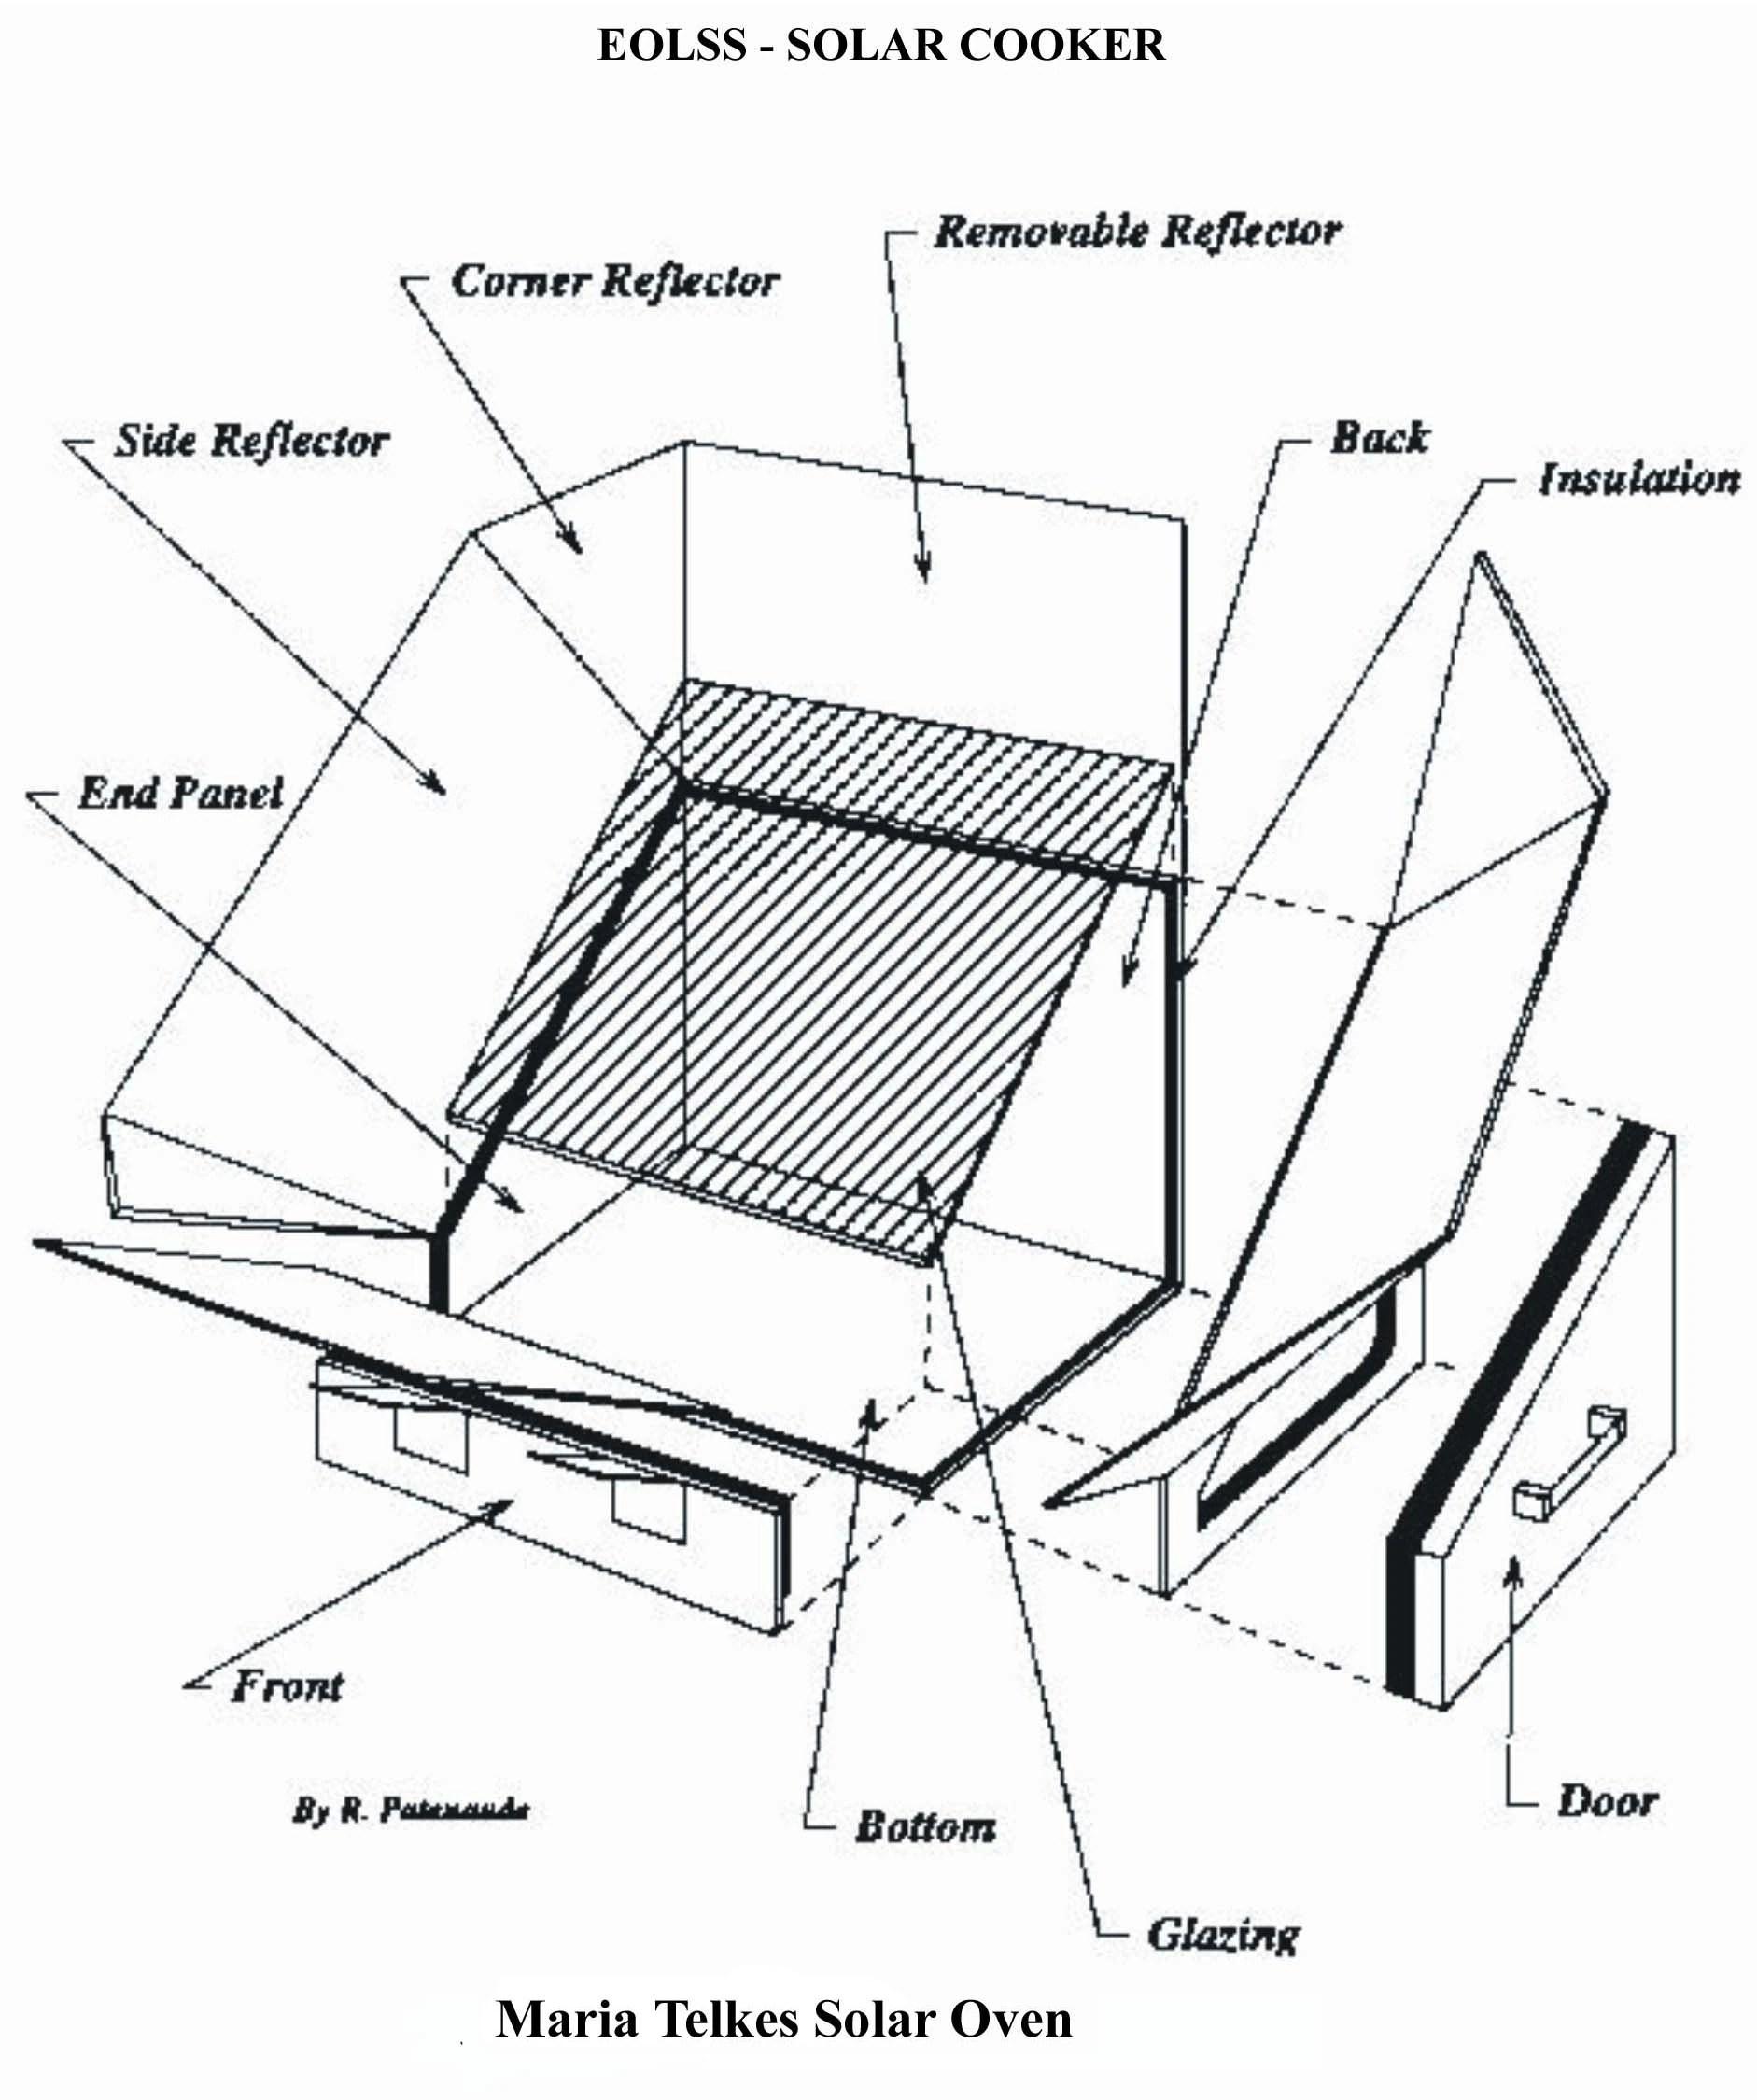 Solar Cooker Design Maria Telkes